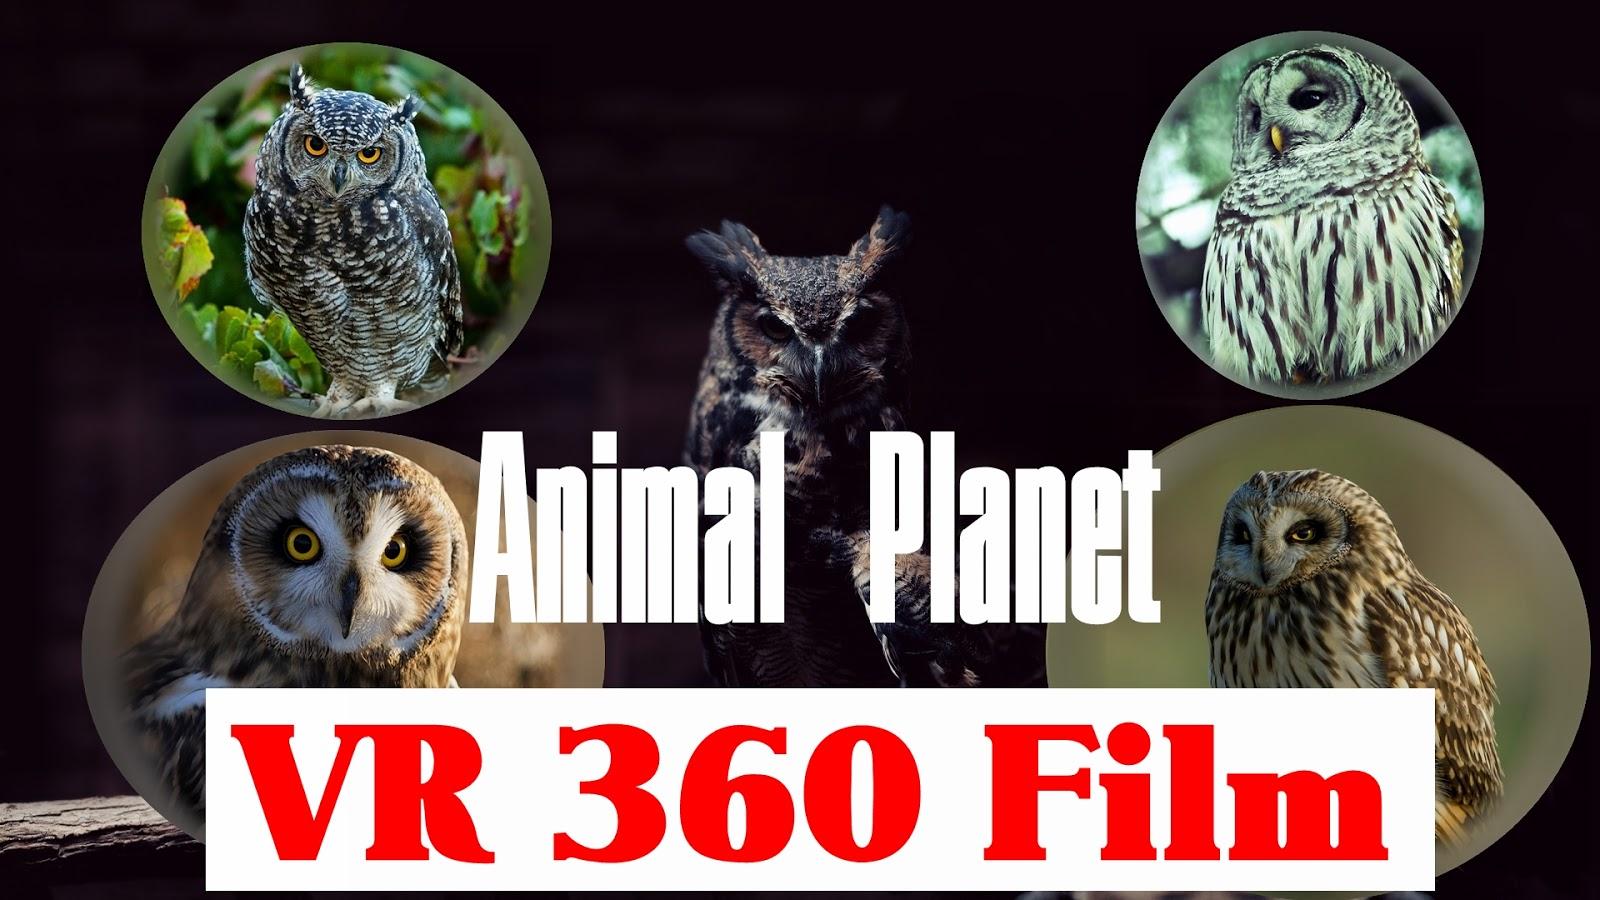 Vr 360 Animal Planet Owl Storytelling Film 3d Animation